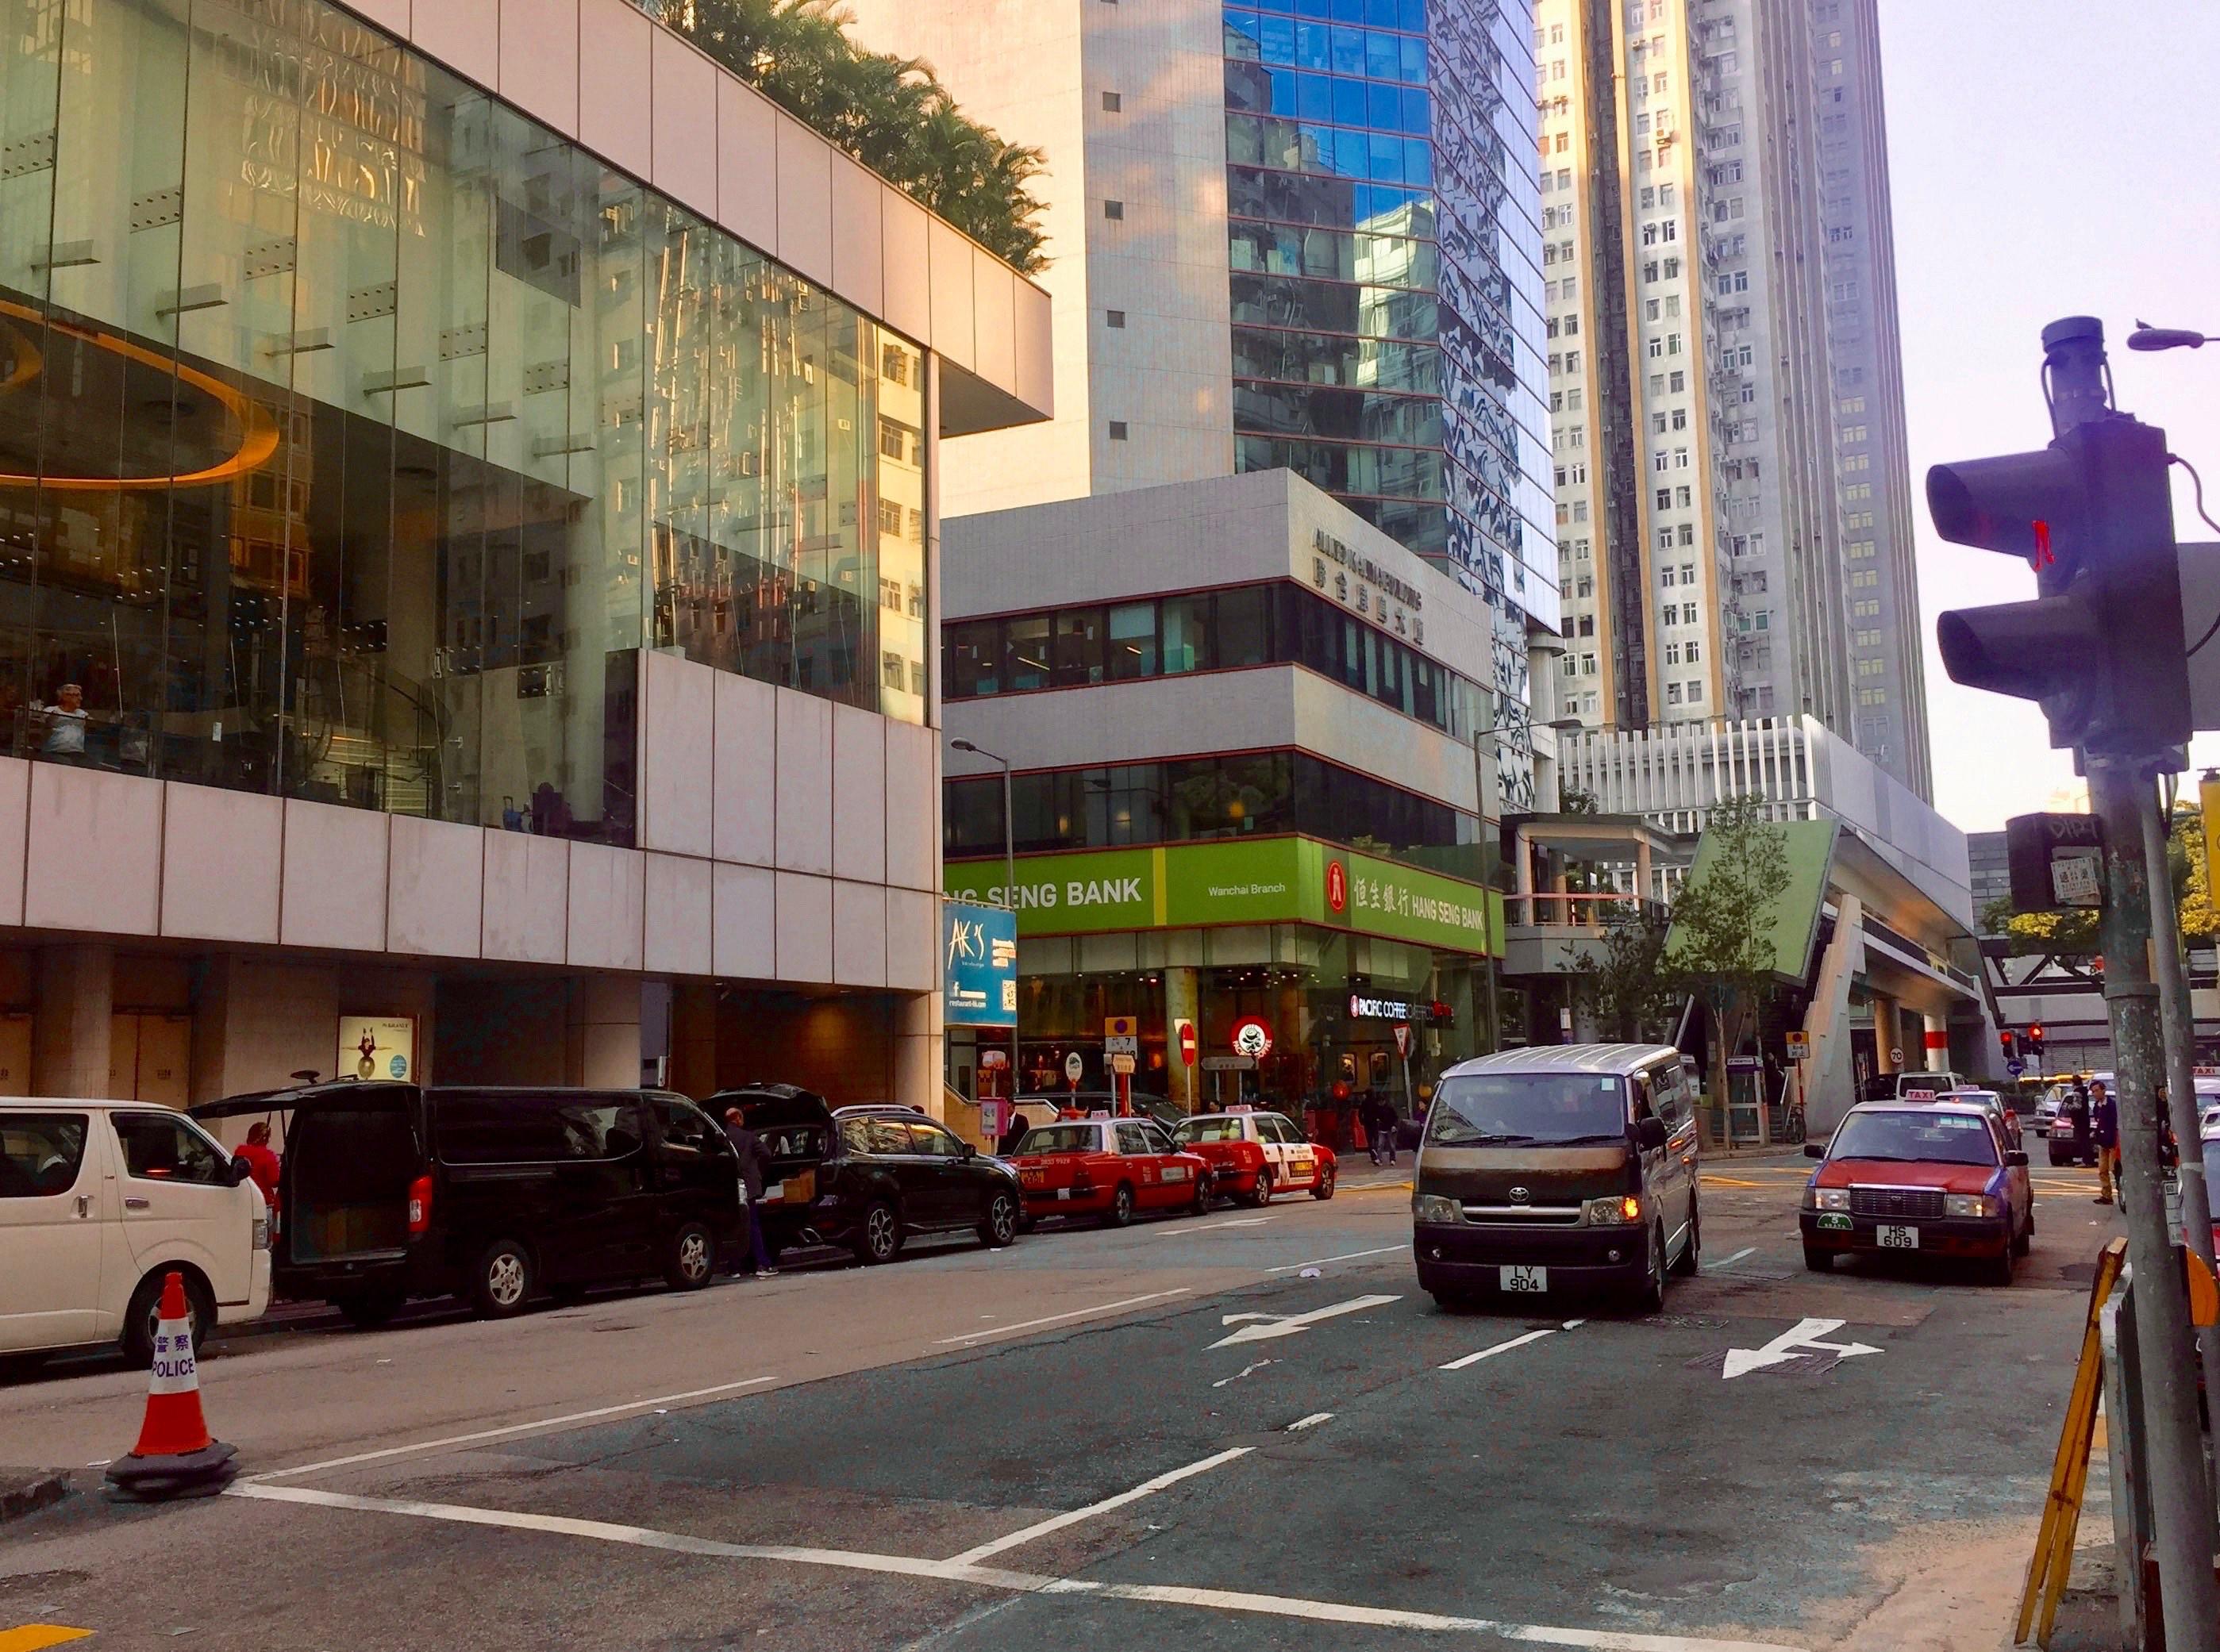 Jaffe Rd. Stewert Rd, Wan Chai Hong Kong - FB space for lease